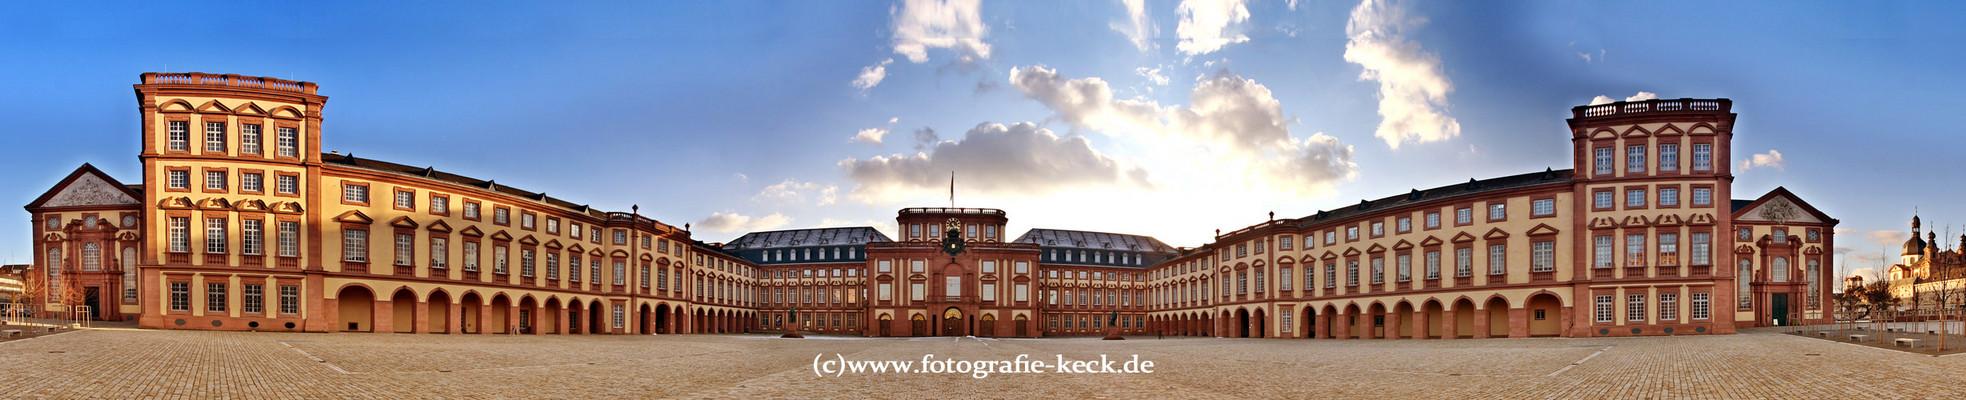 Mannheimer Schloss im Februar 2009